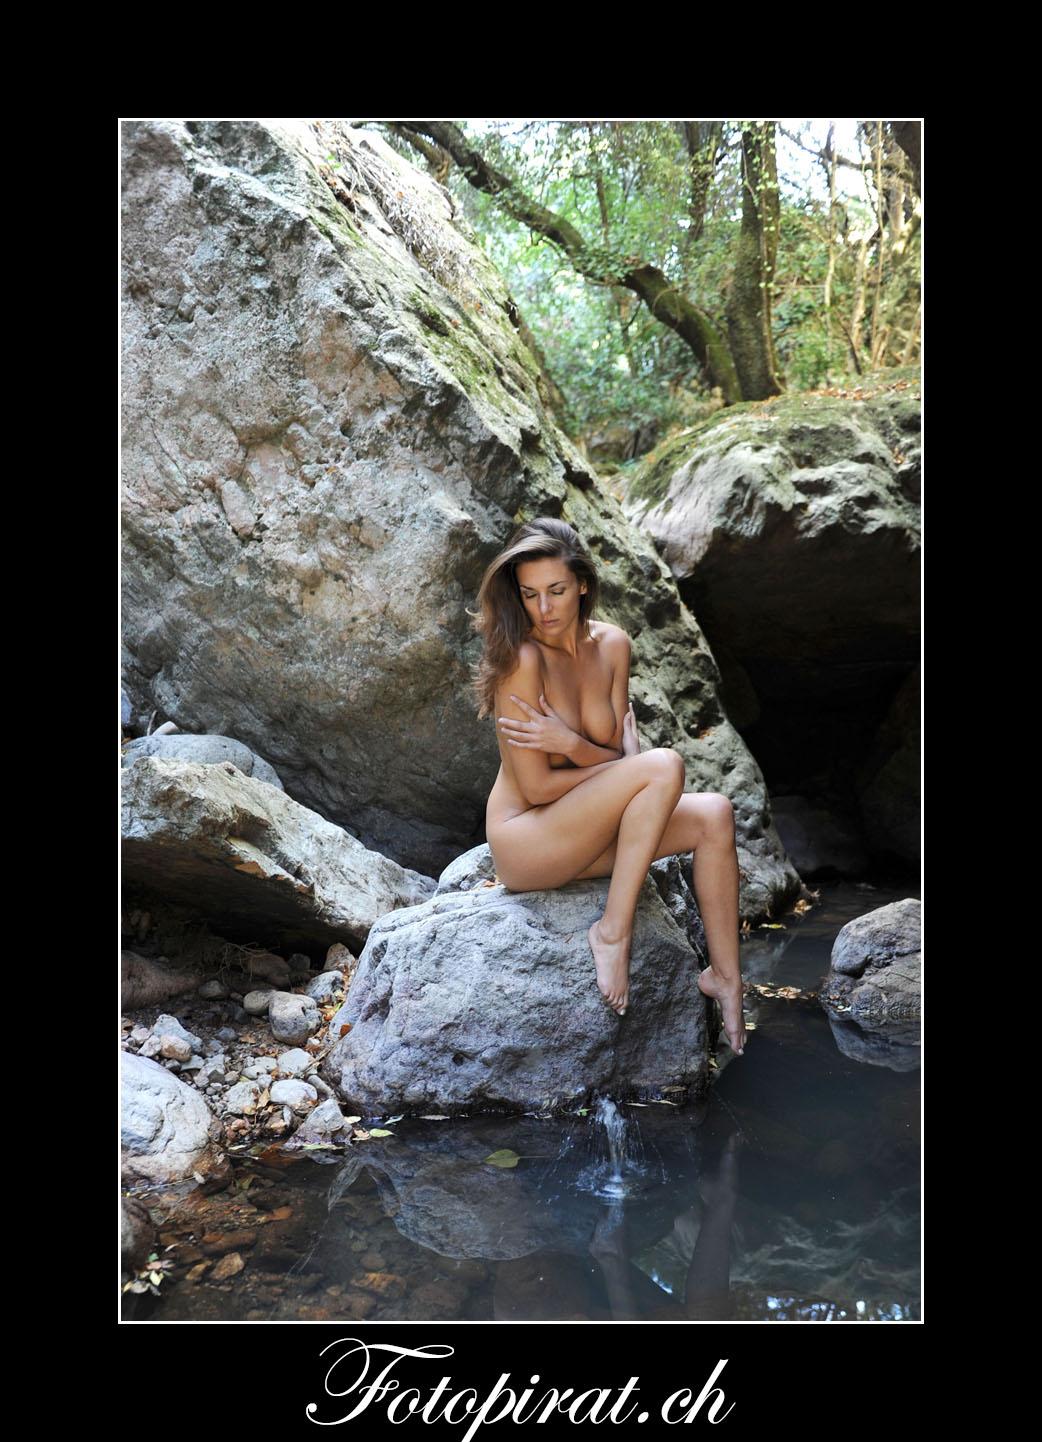 Fotoshooting, Outdoor, Akt, Nackt, Nudeart, Nude, Modelagentur, Fotomodel, erotik, Cotze azure, Frau